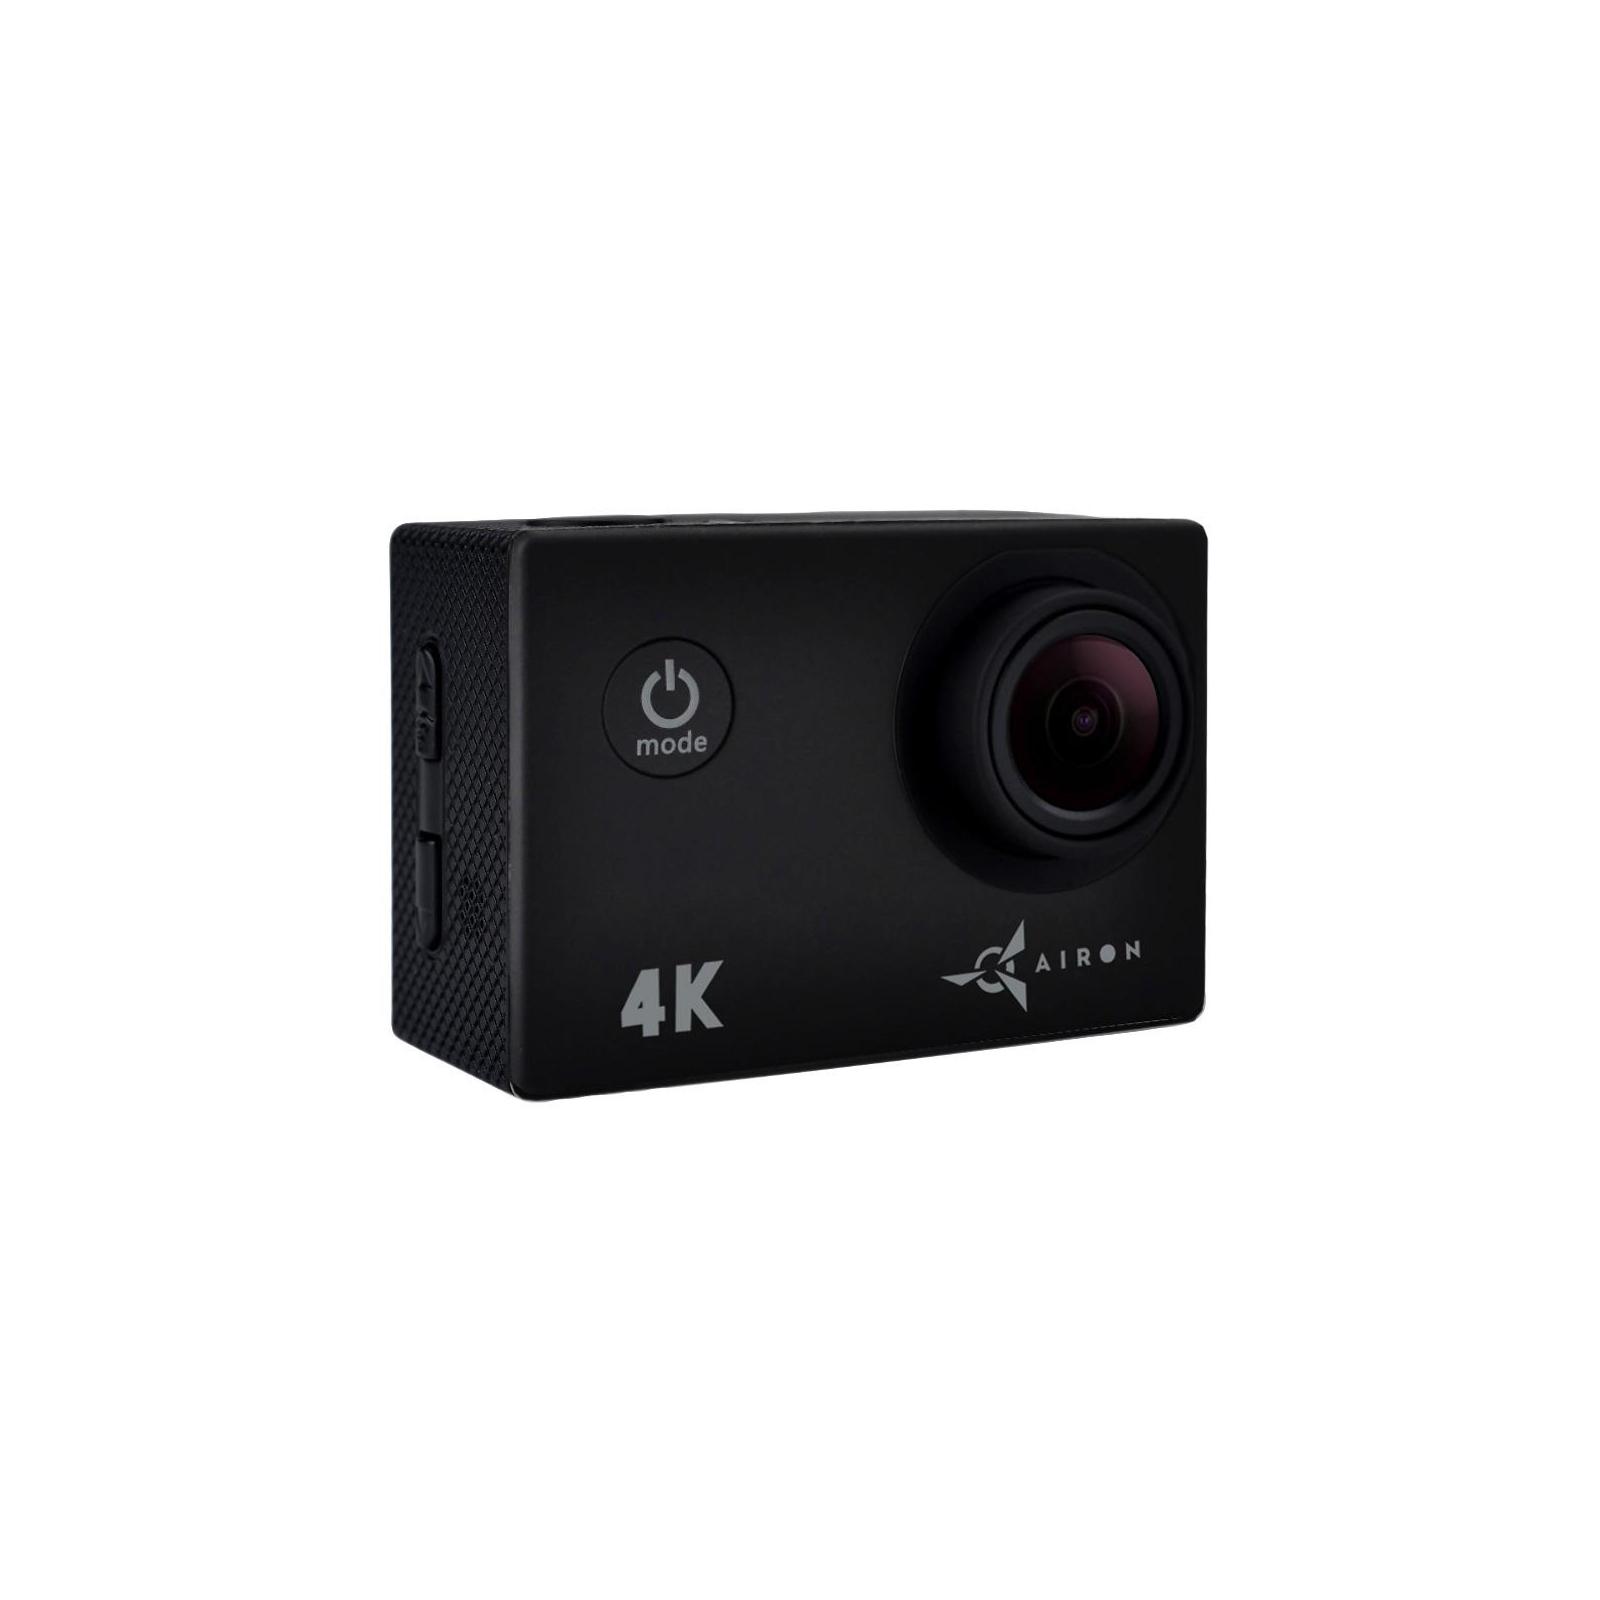 Экшн-камера AirOn Simple 4K (4822356754473) изображение 6